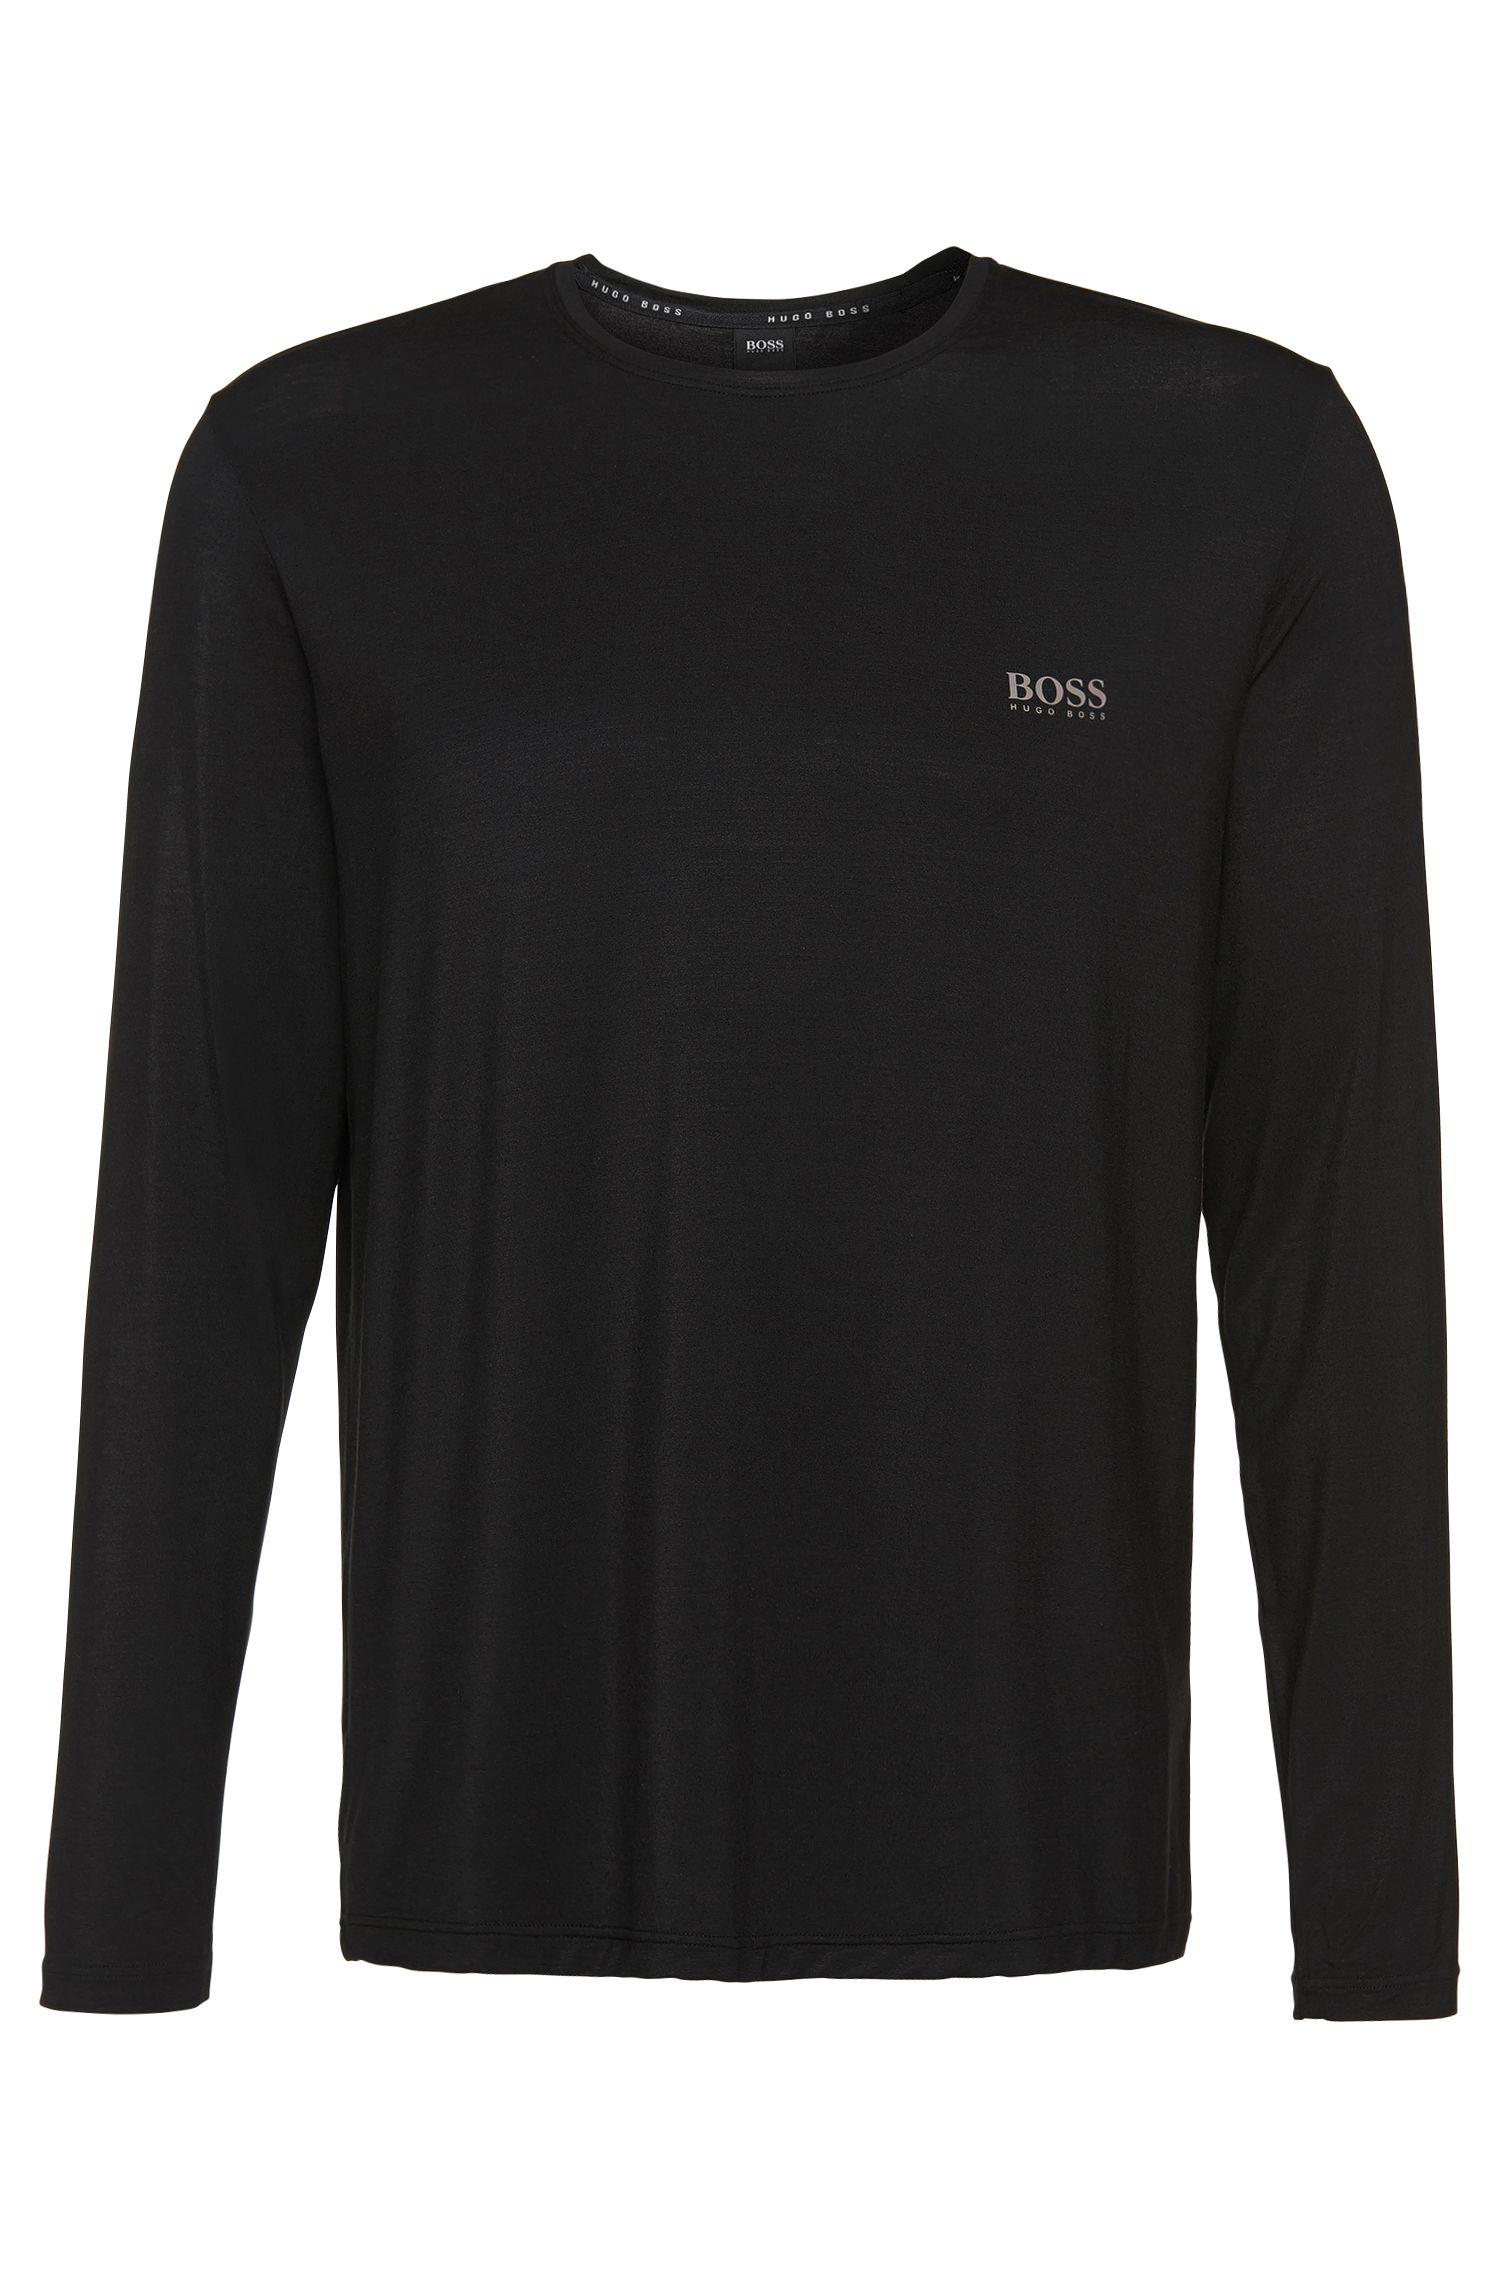 Long-sleeved shirt in stretch modal blend: 'Shirt RN LS'